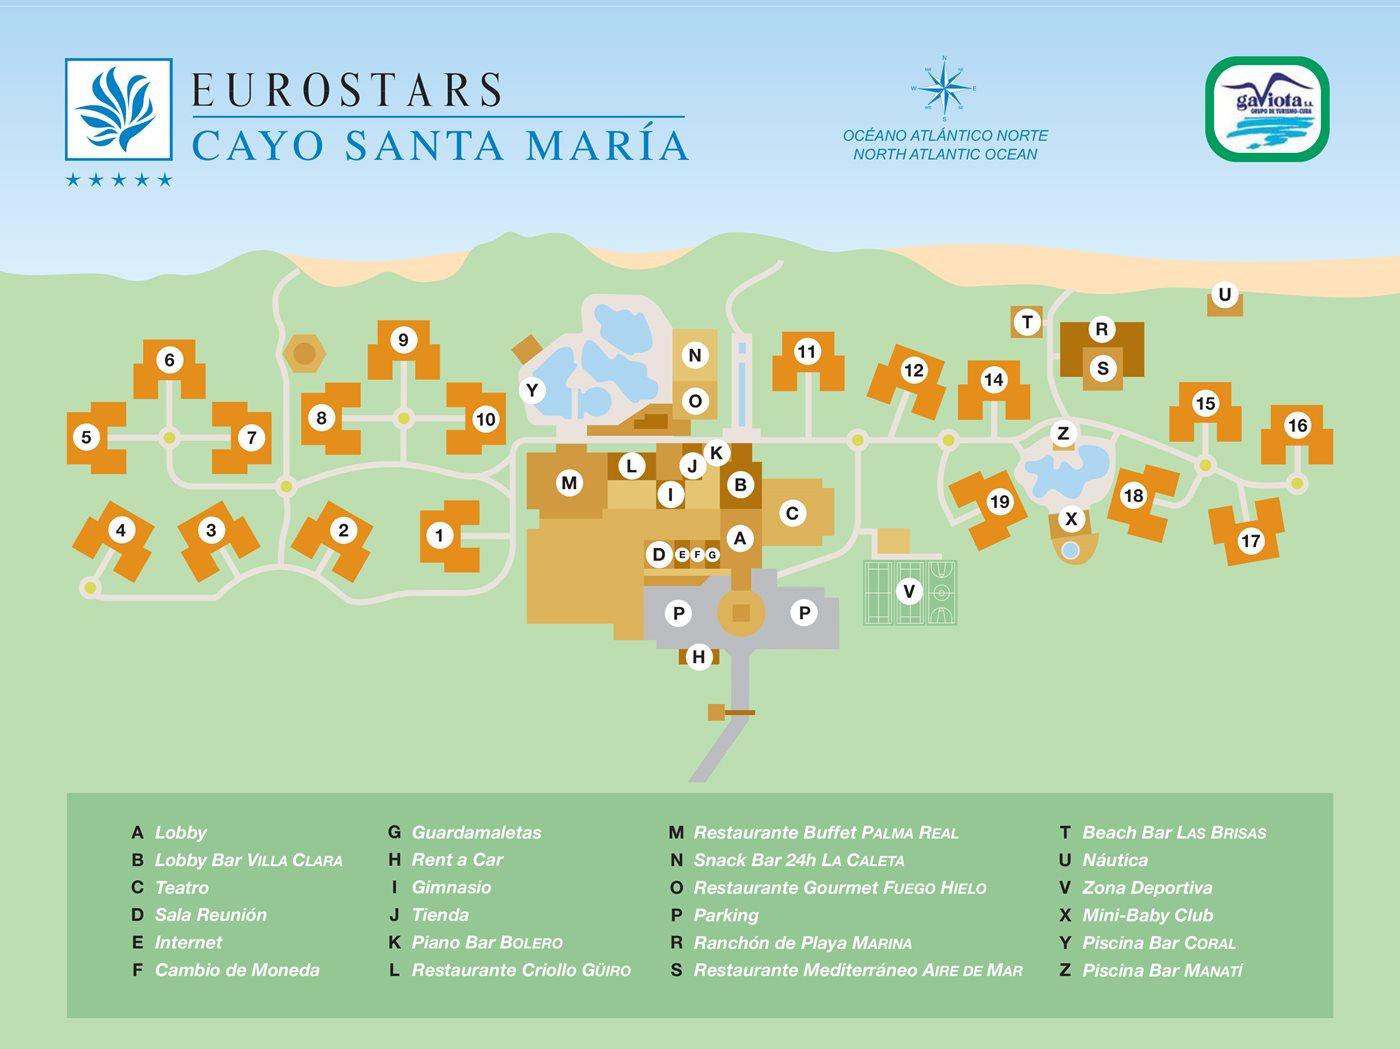 Golden Tulip Aguas Claras Resort Cayo Santa Maria Transat Hotel Network Topology Diagram Guesthouse Wifi